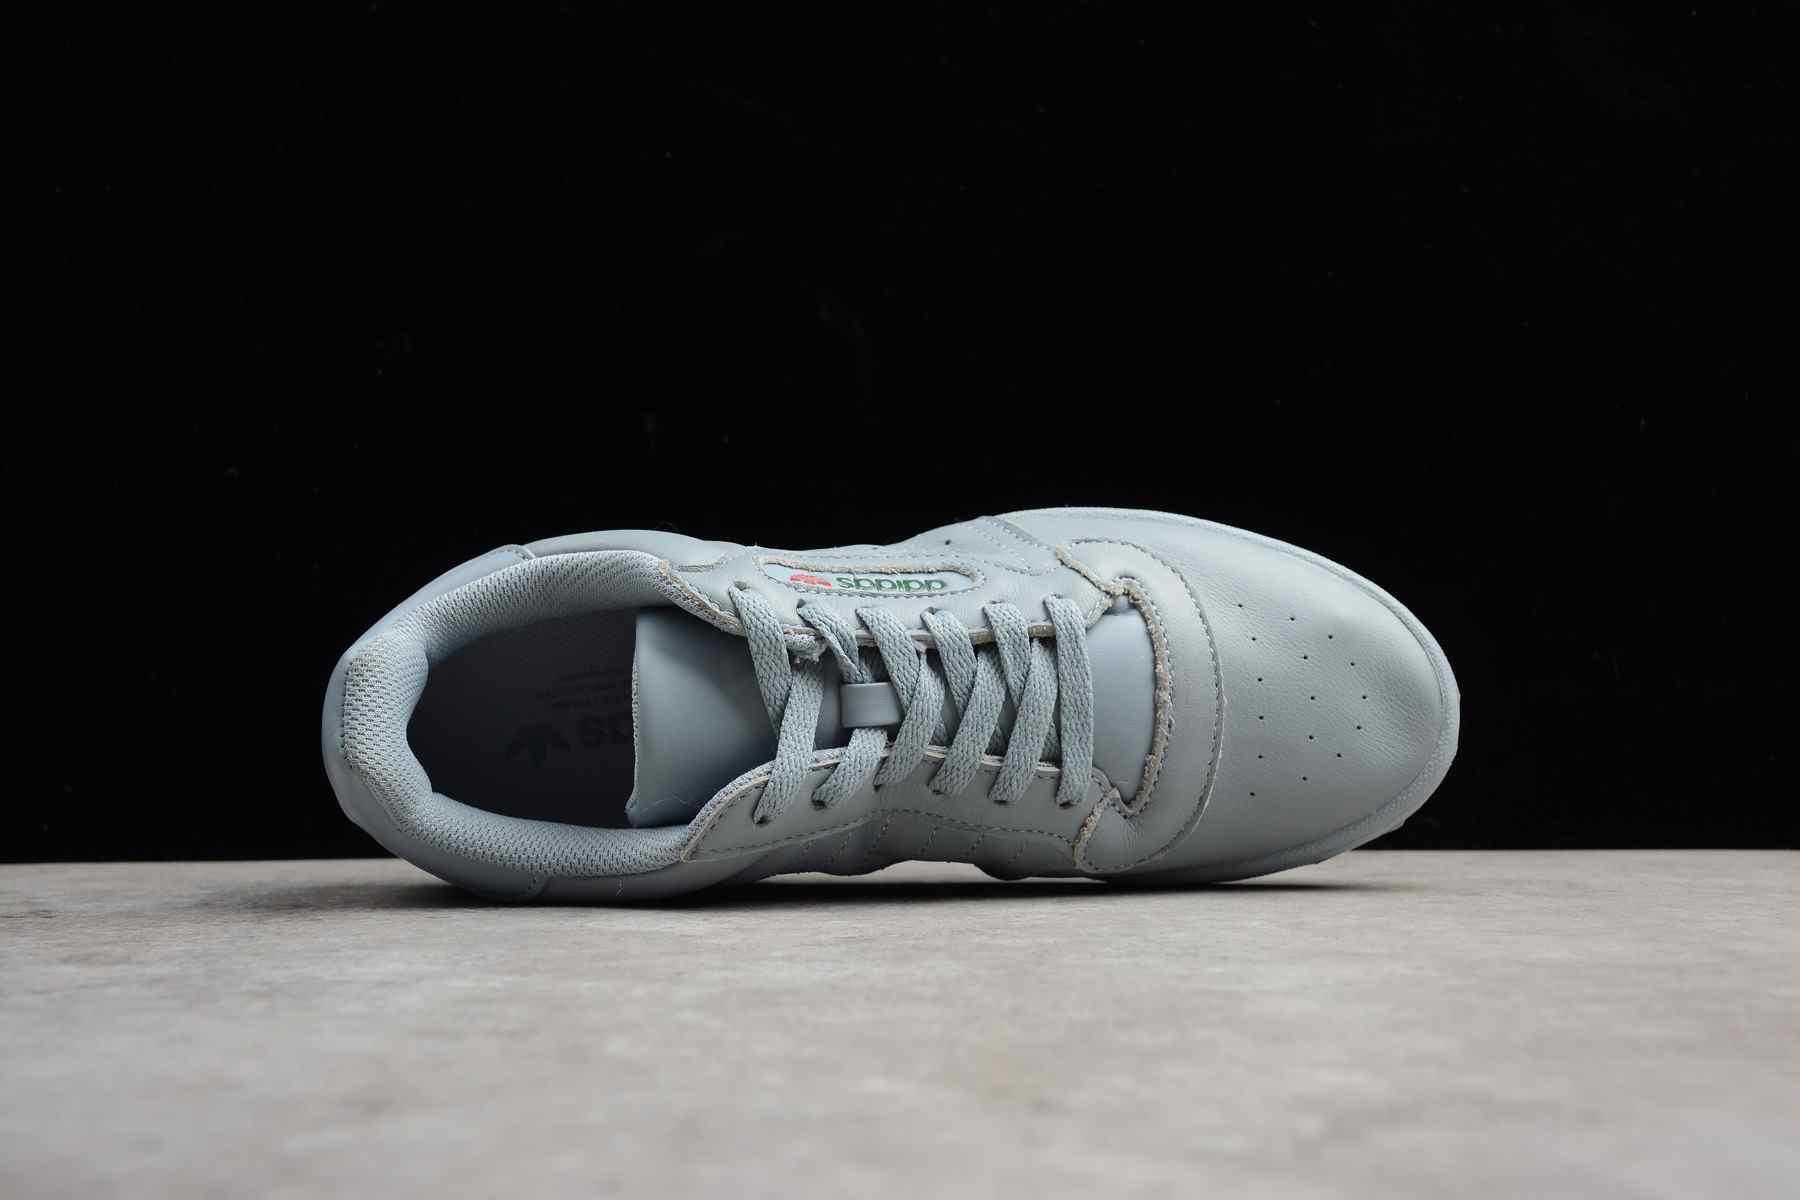 Yeezy Powerphase Calabasas Grey-8